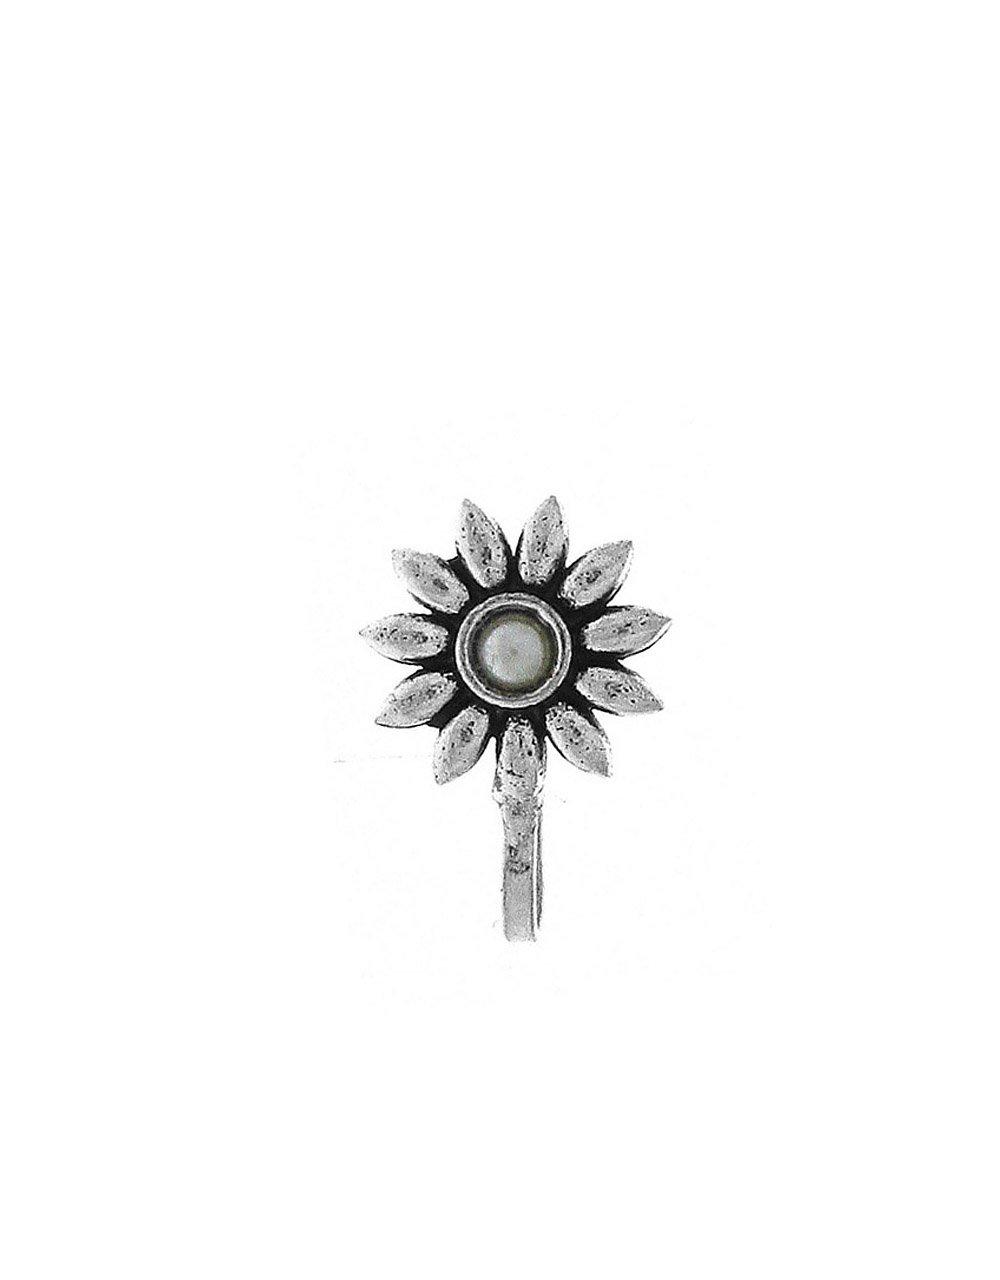 Anuradha Art Silver Oxide Finish Flower Styled Designer Clip-On Nose Ring/Pin For Women/Girls